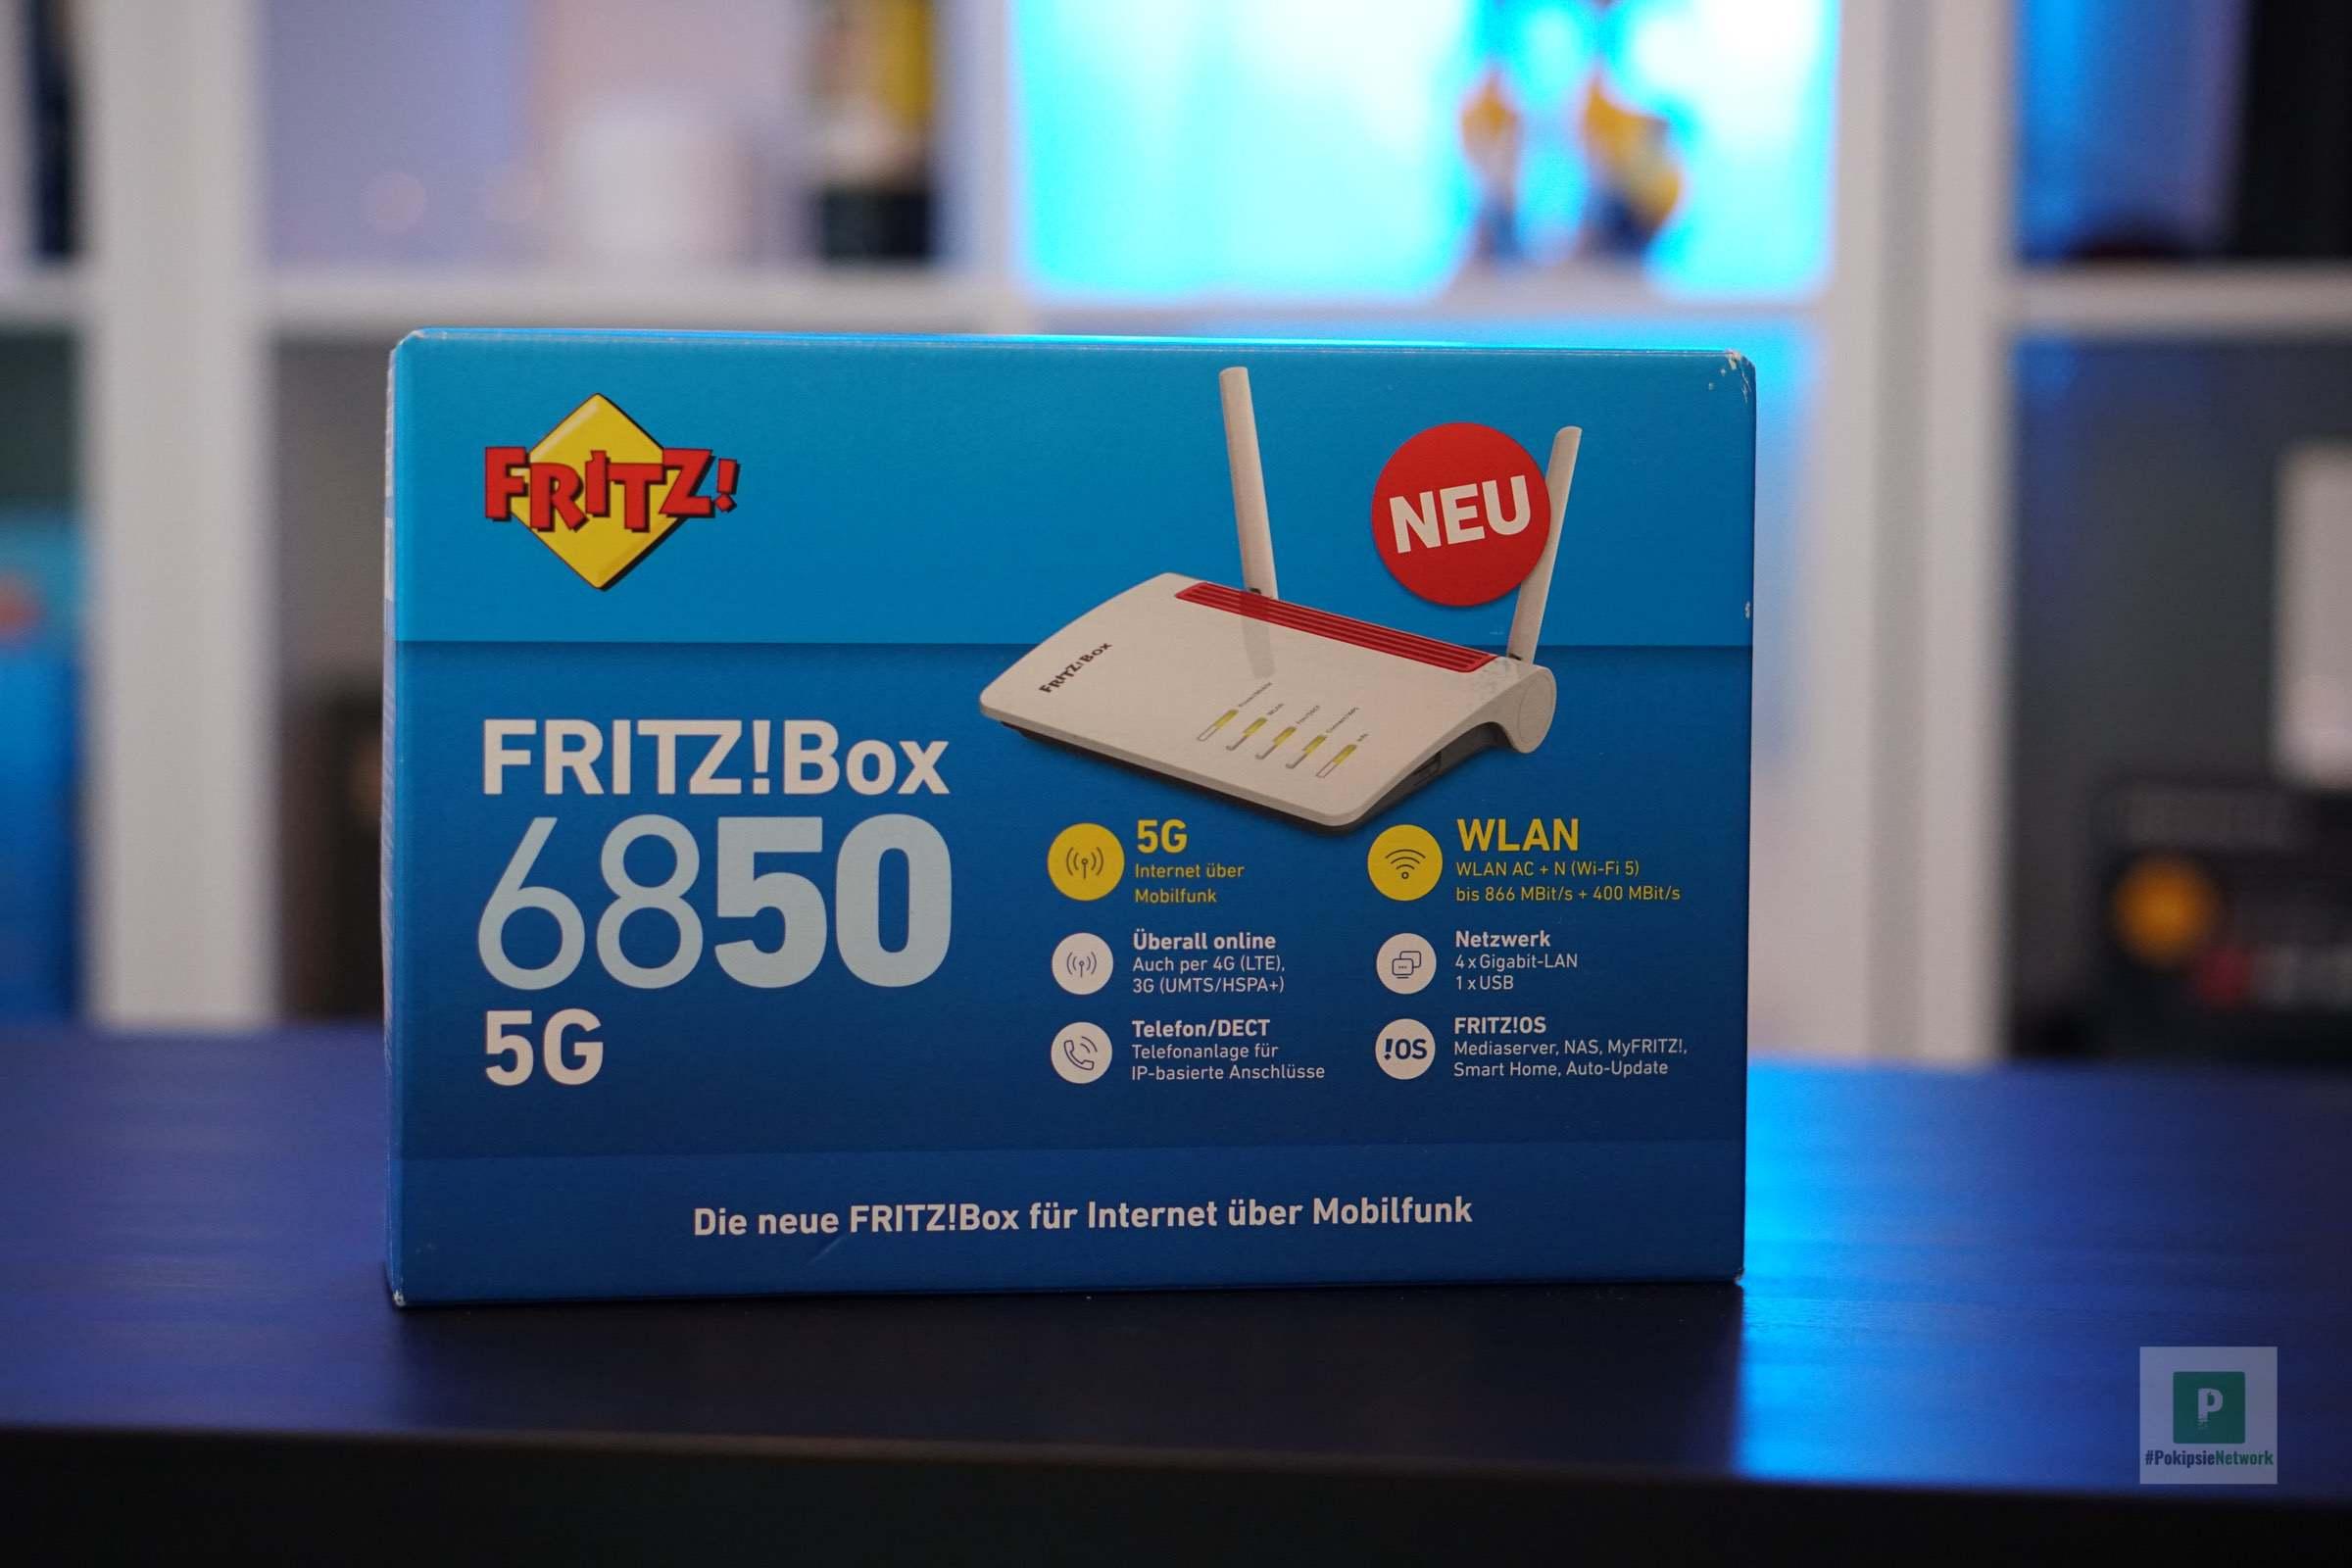 AVM FRITZ!Box 6850 5G angekündigt